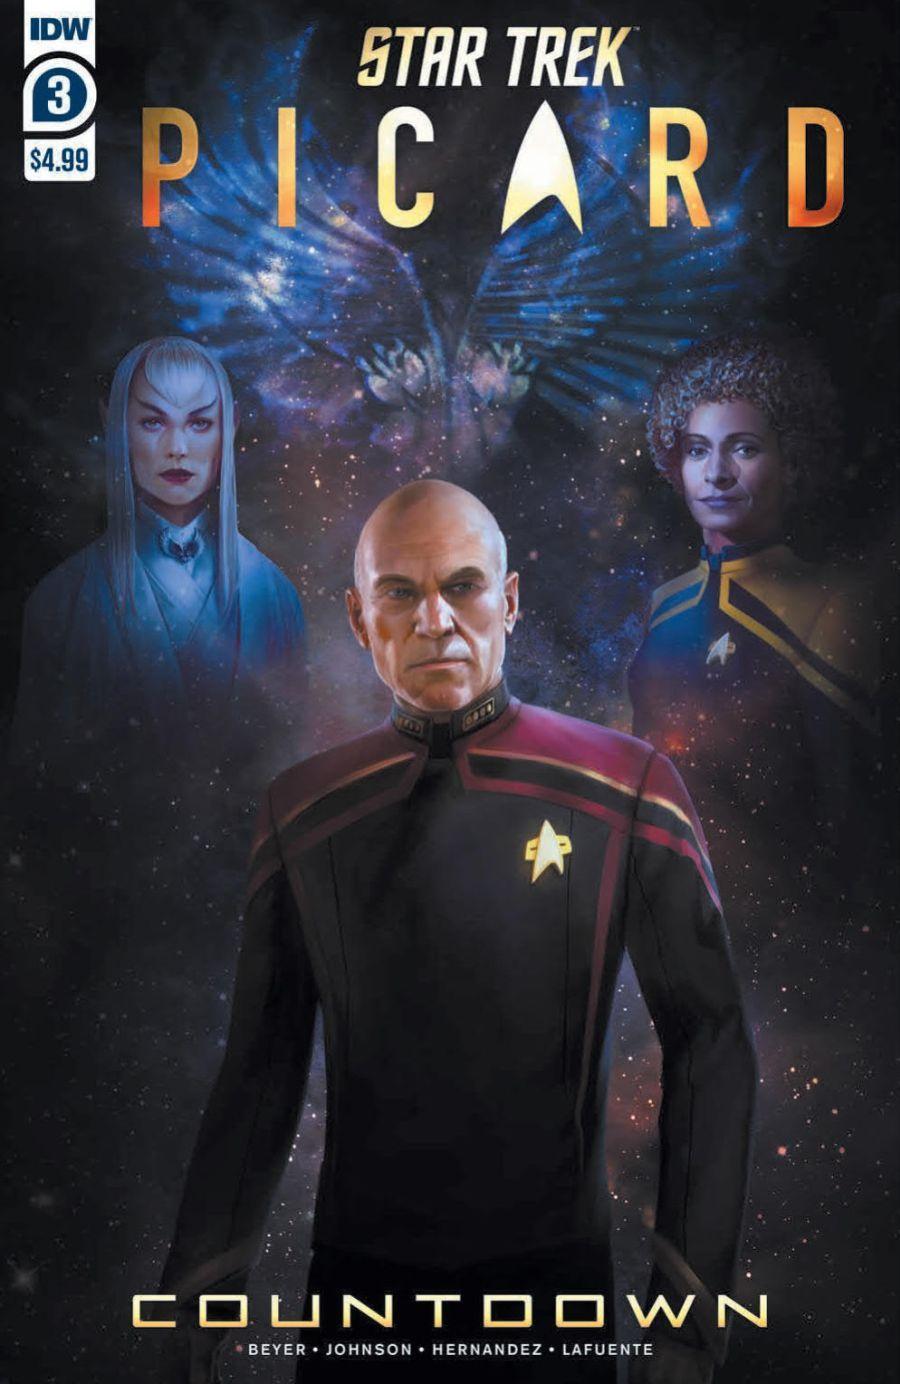 ST_Picard03-pr_1